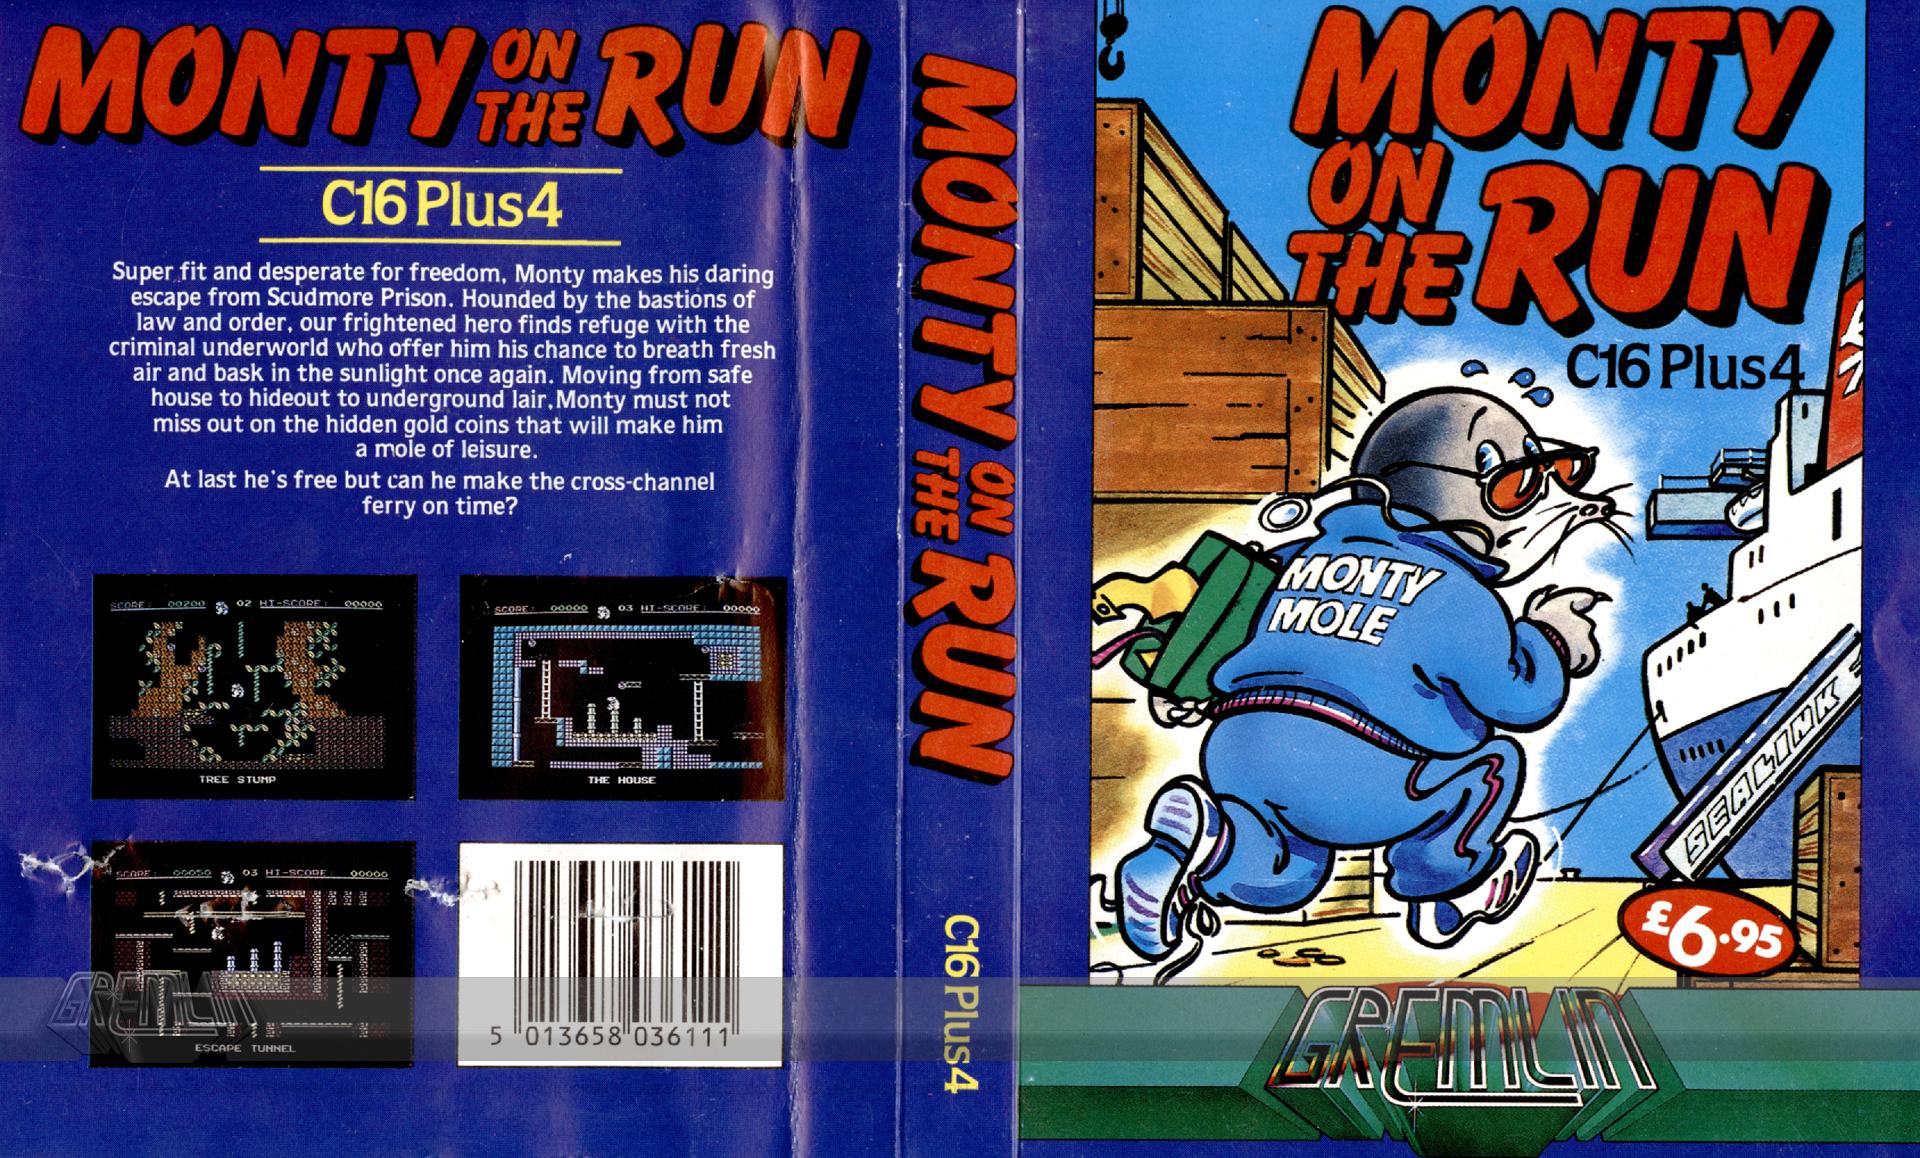 Monty on the Run (C16 Plus/4)